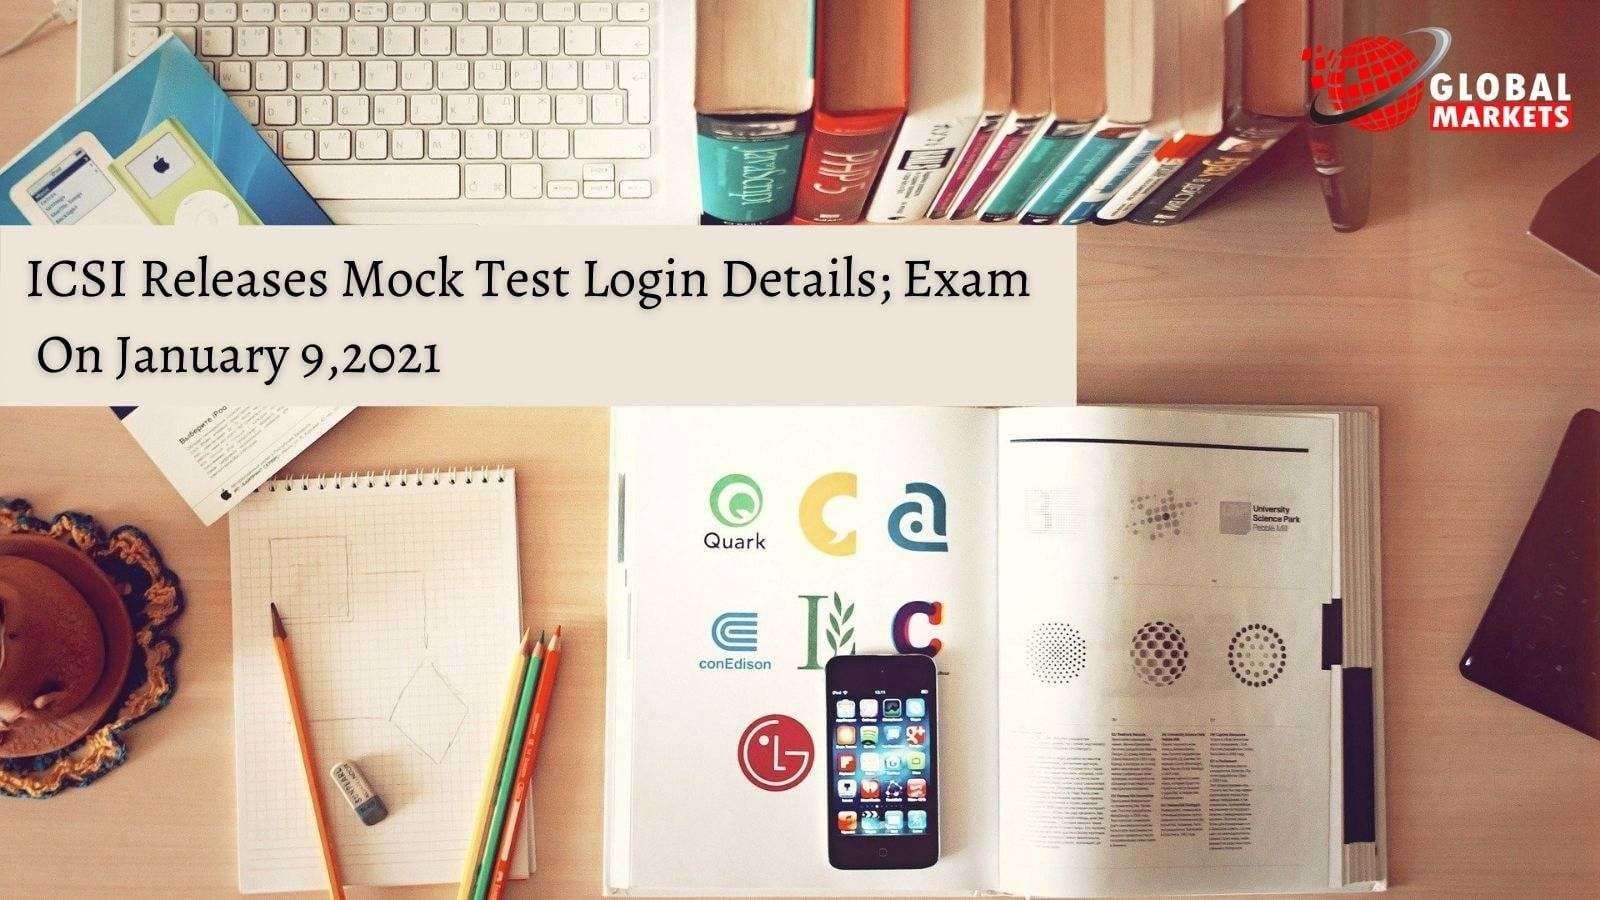 ICSI Releases Mock Test Login Details; Exam On January 9, 2021